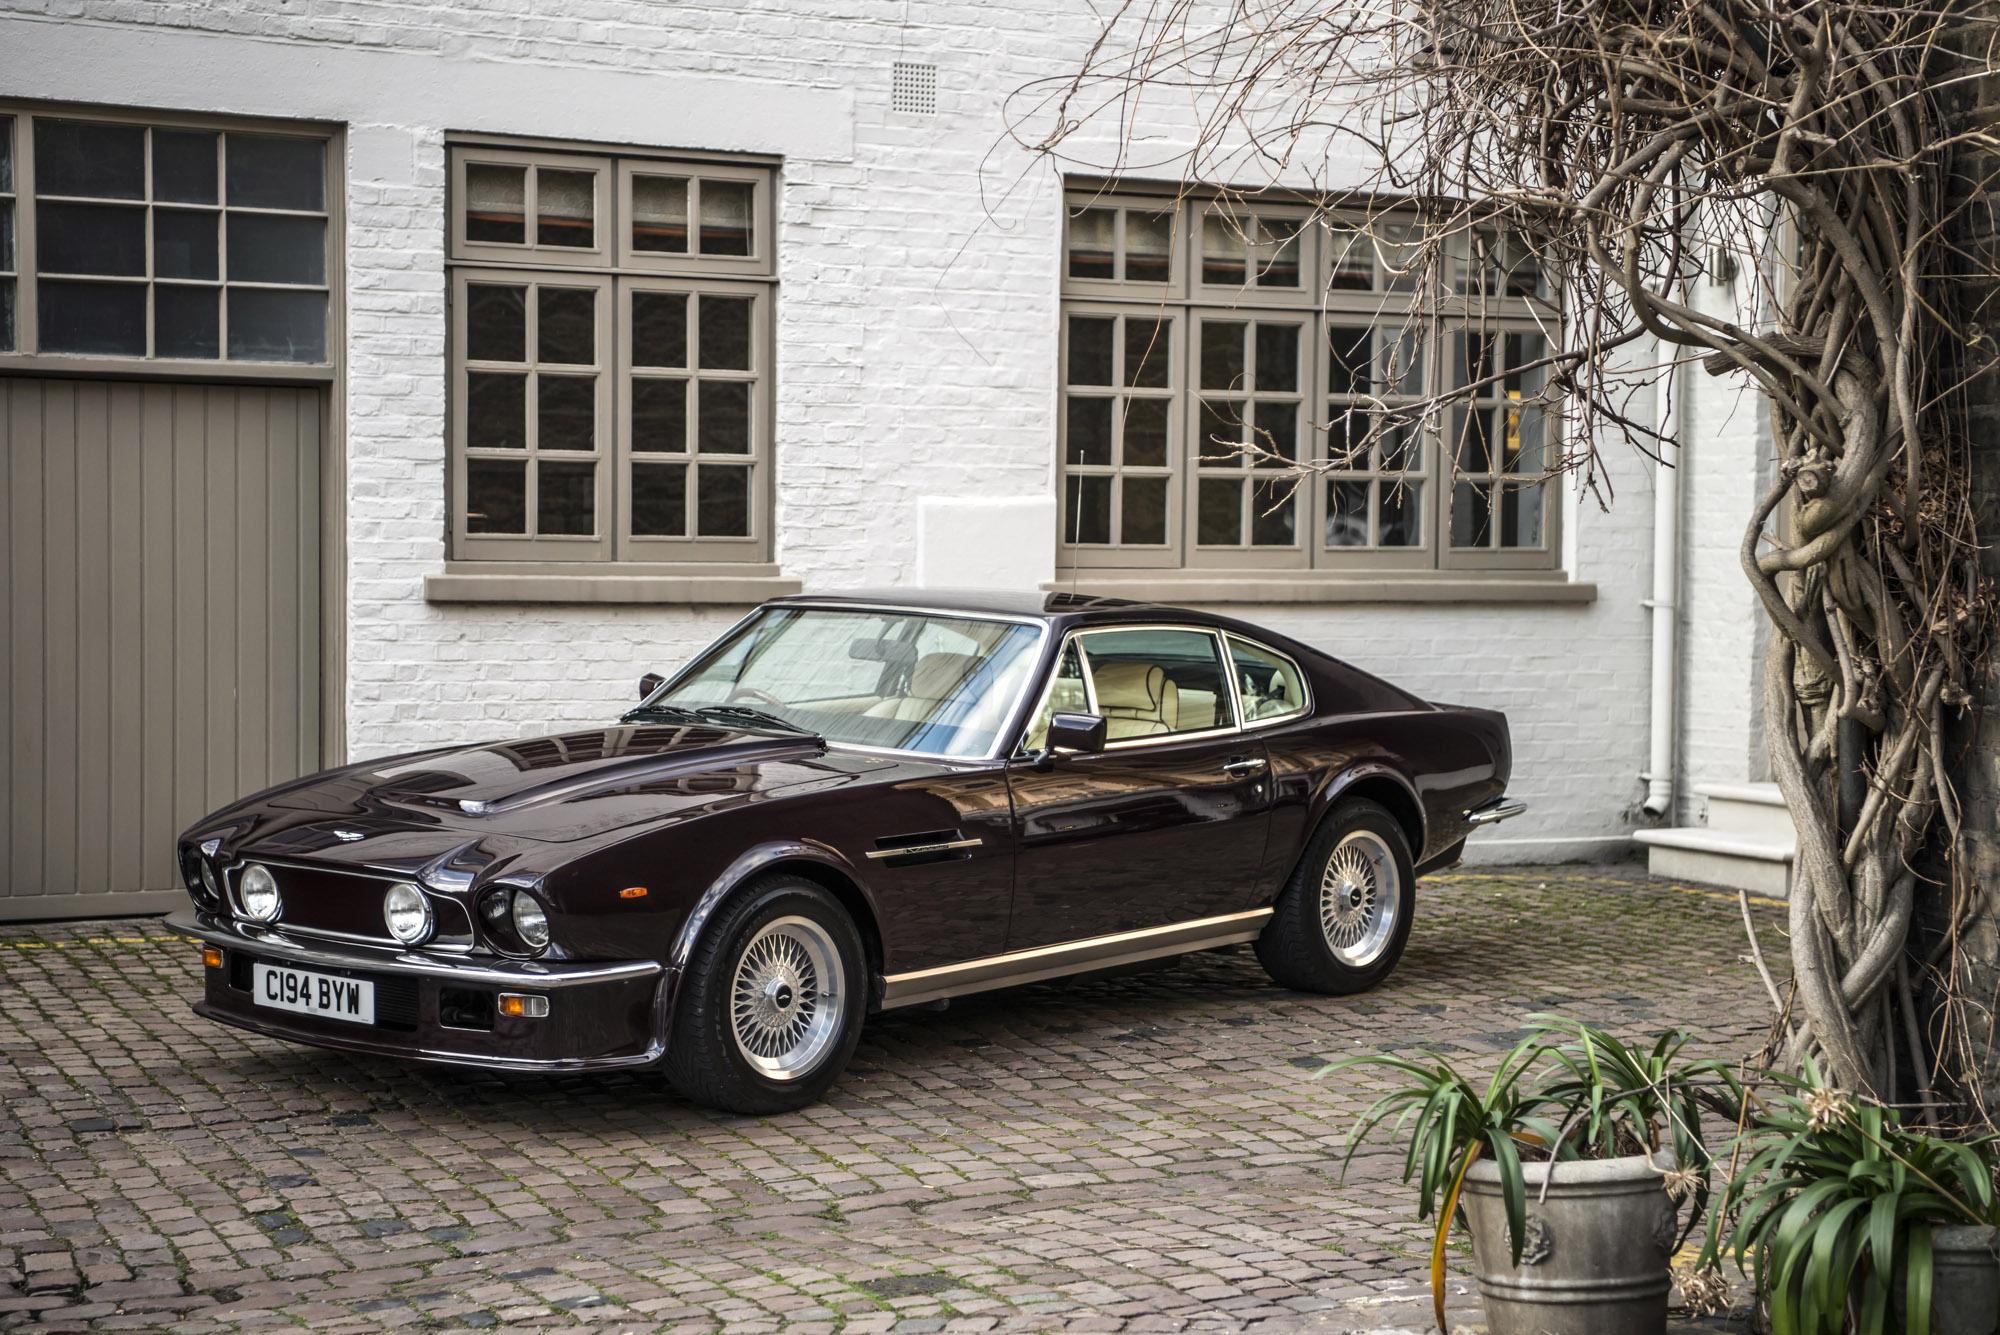 1985 Aston Martin V8 Vantage | Cars for sale | FISKENS